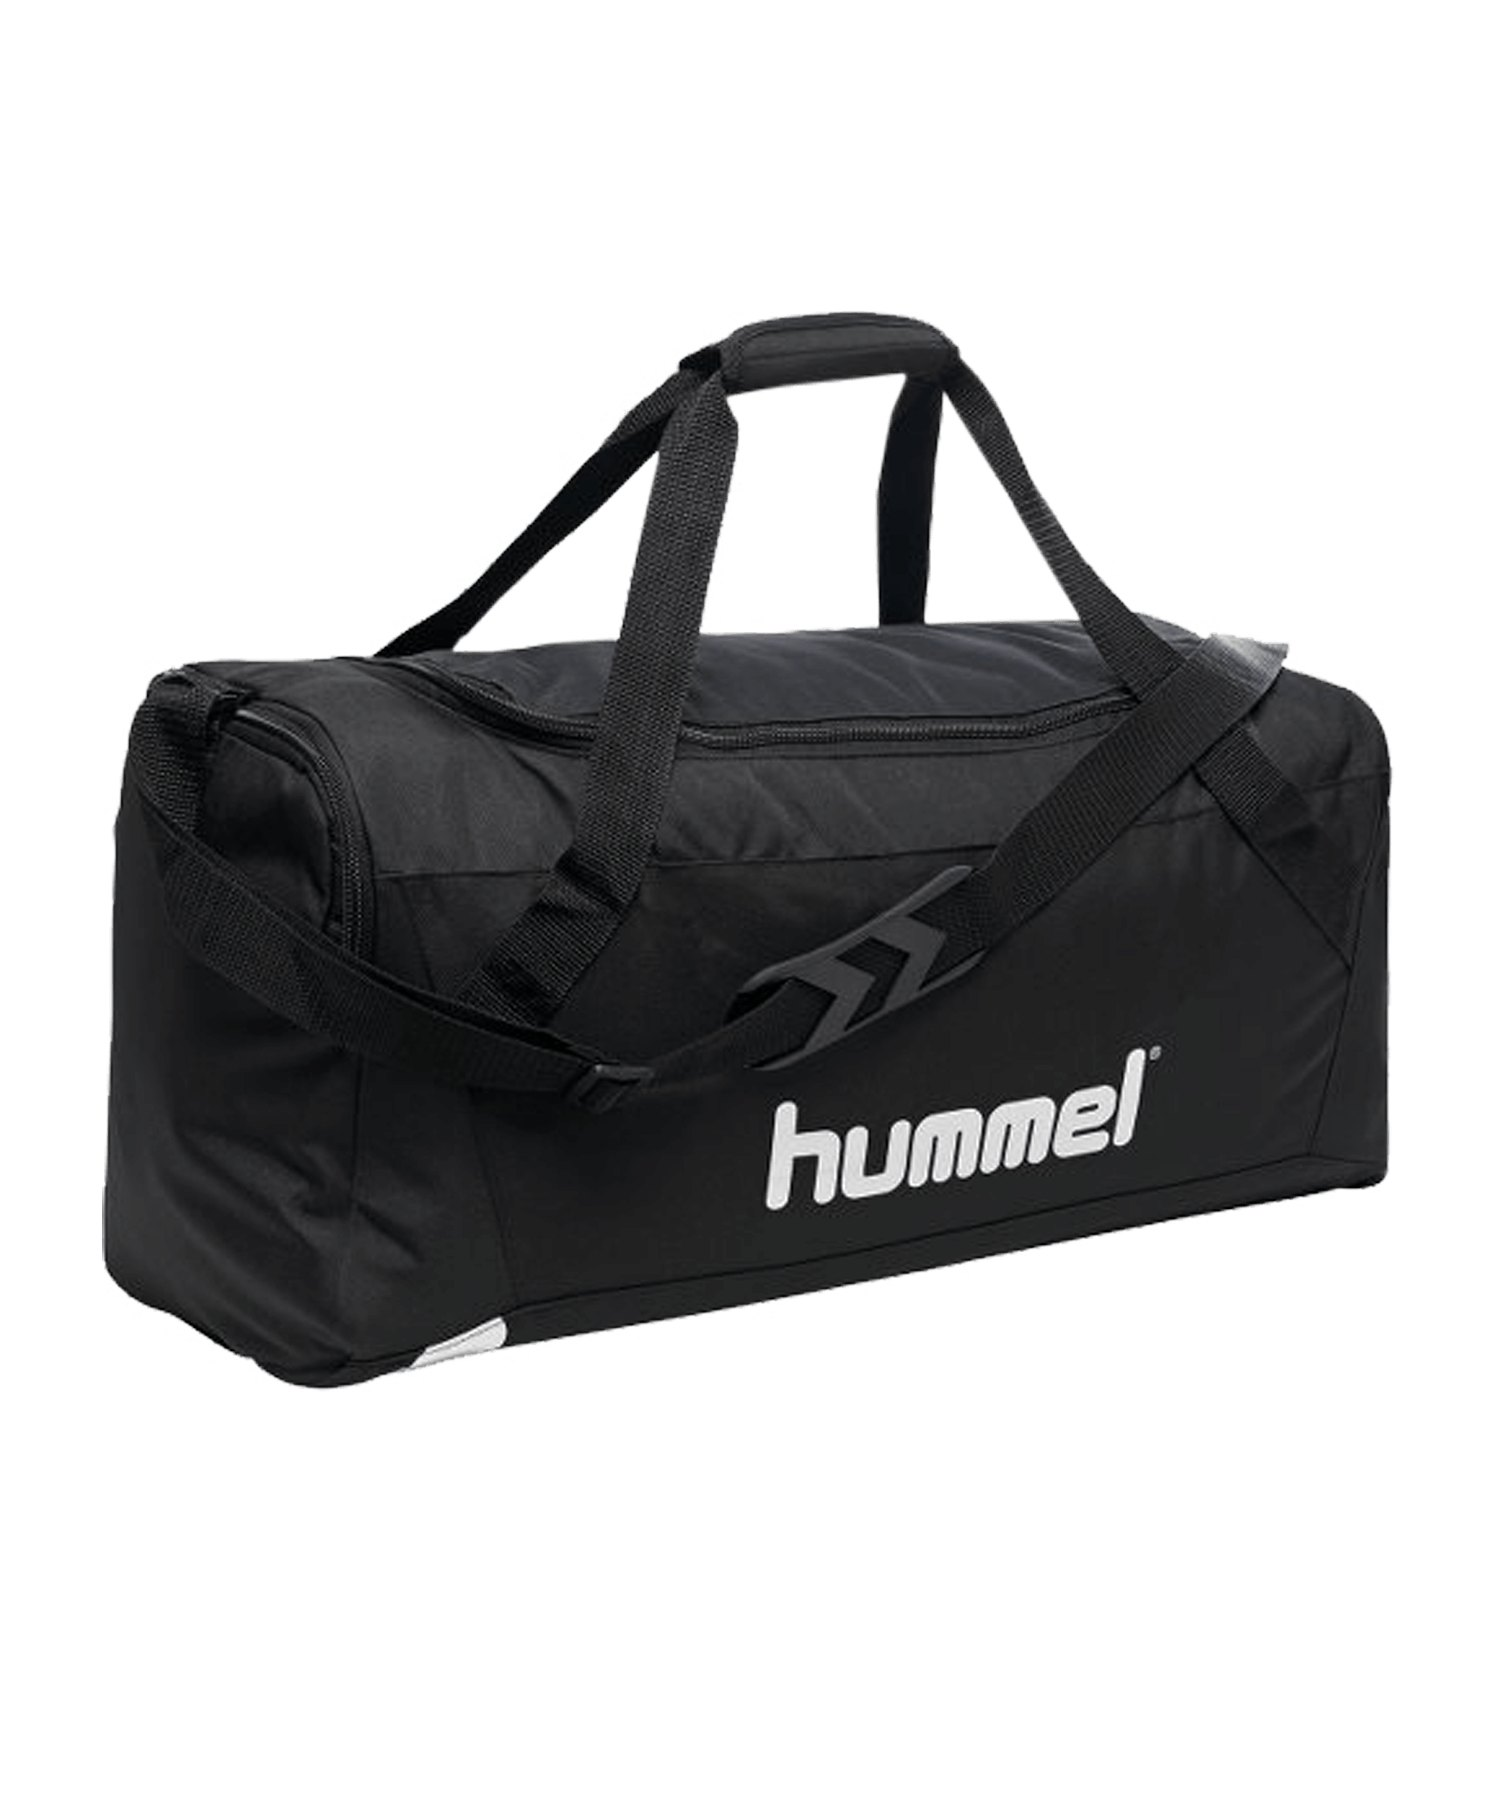 Hummel Core Bag Sporttasche Schwarz F2001 Gr. XS - schwarz